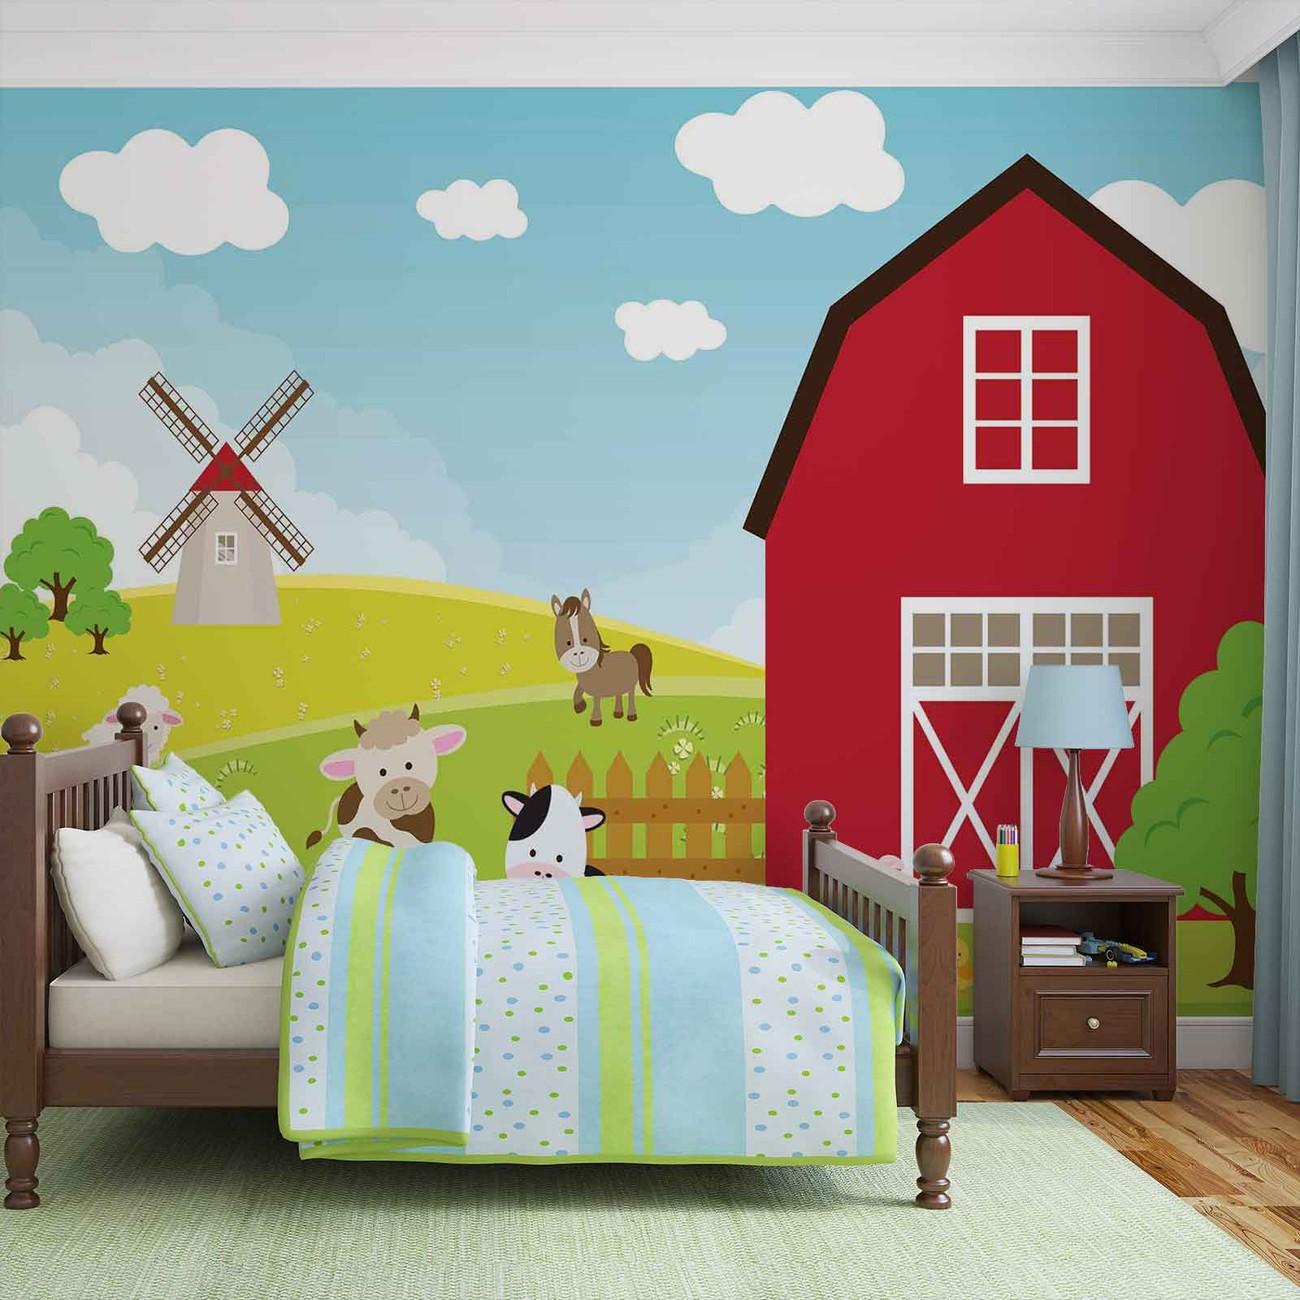 Farm cartoon boys bedroom wall paper mural buy at for Cartoon wall mural